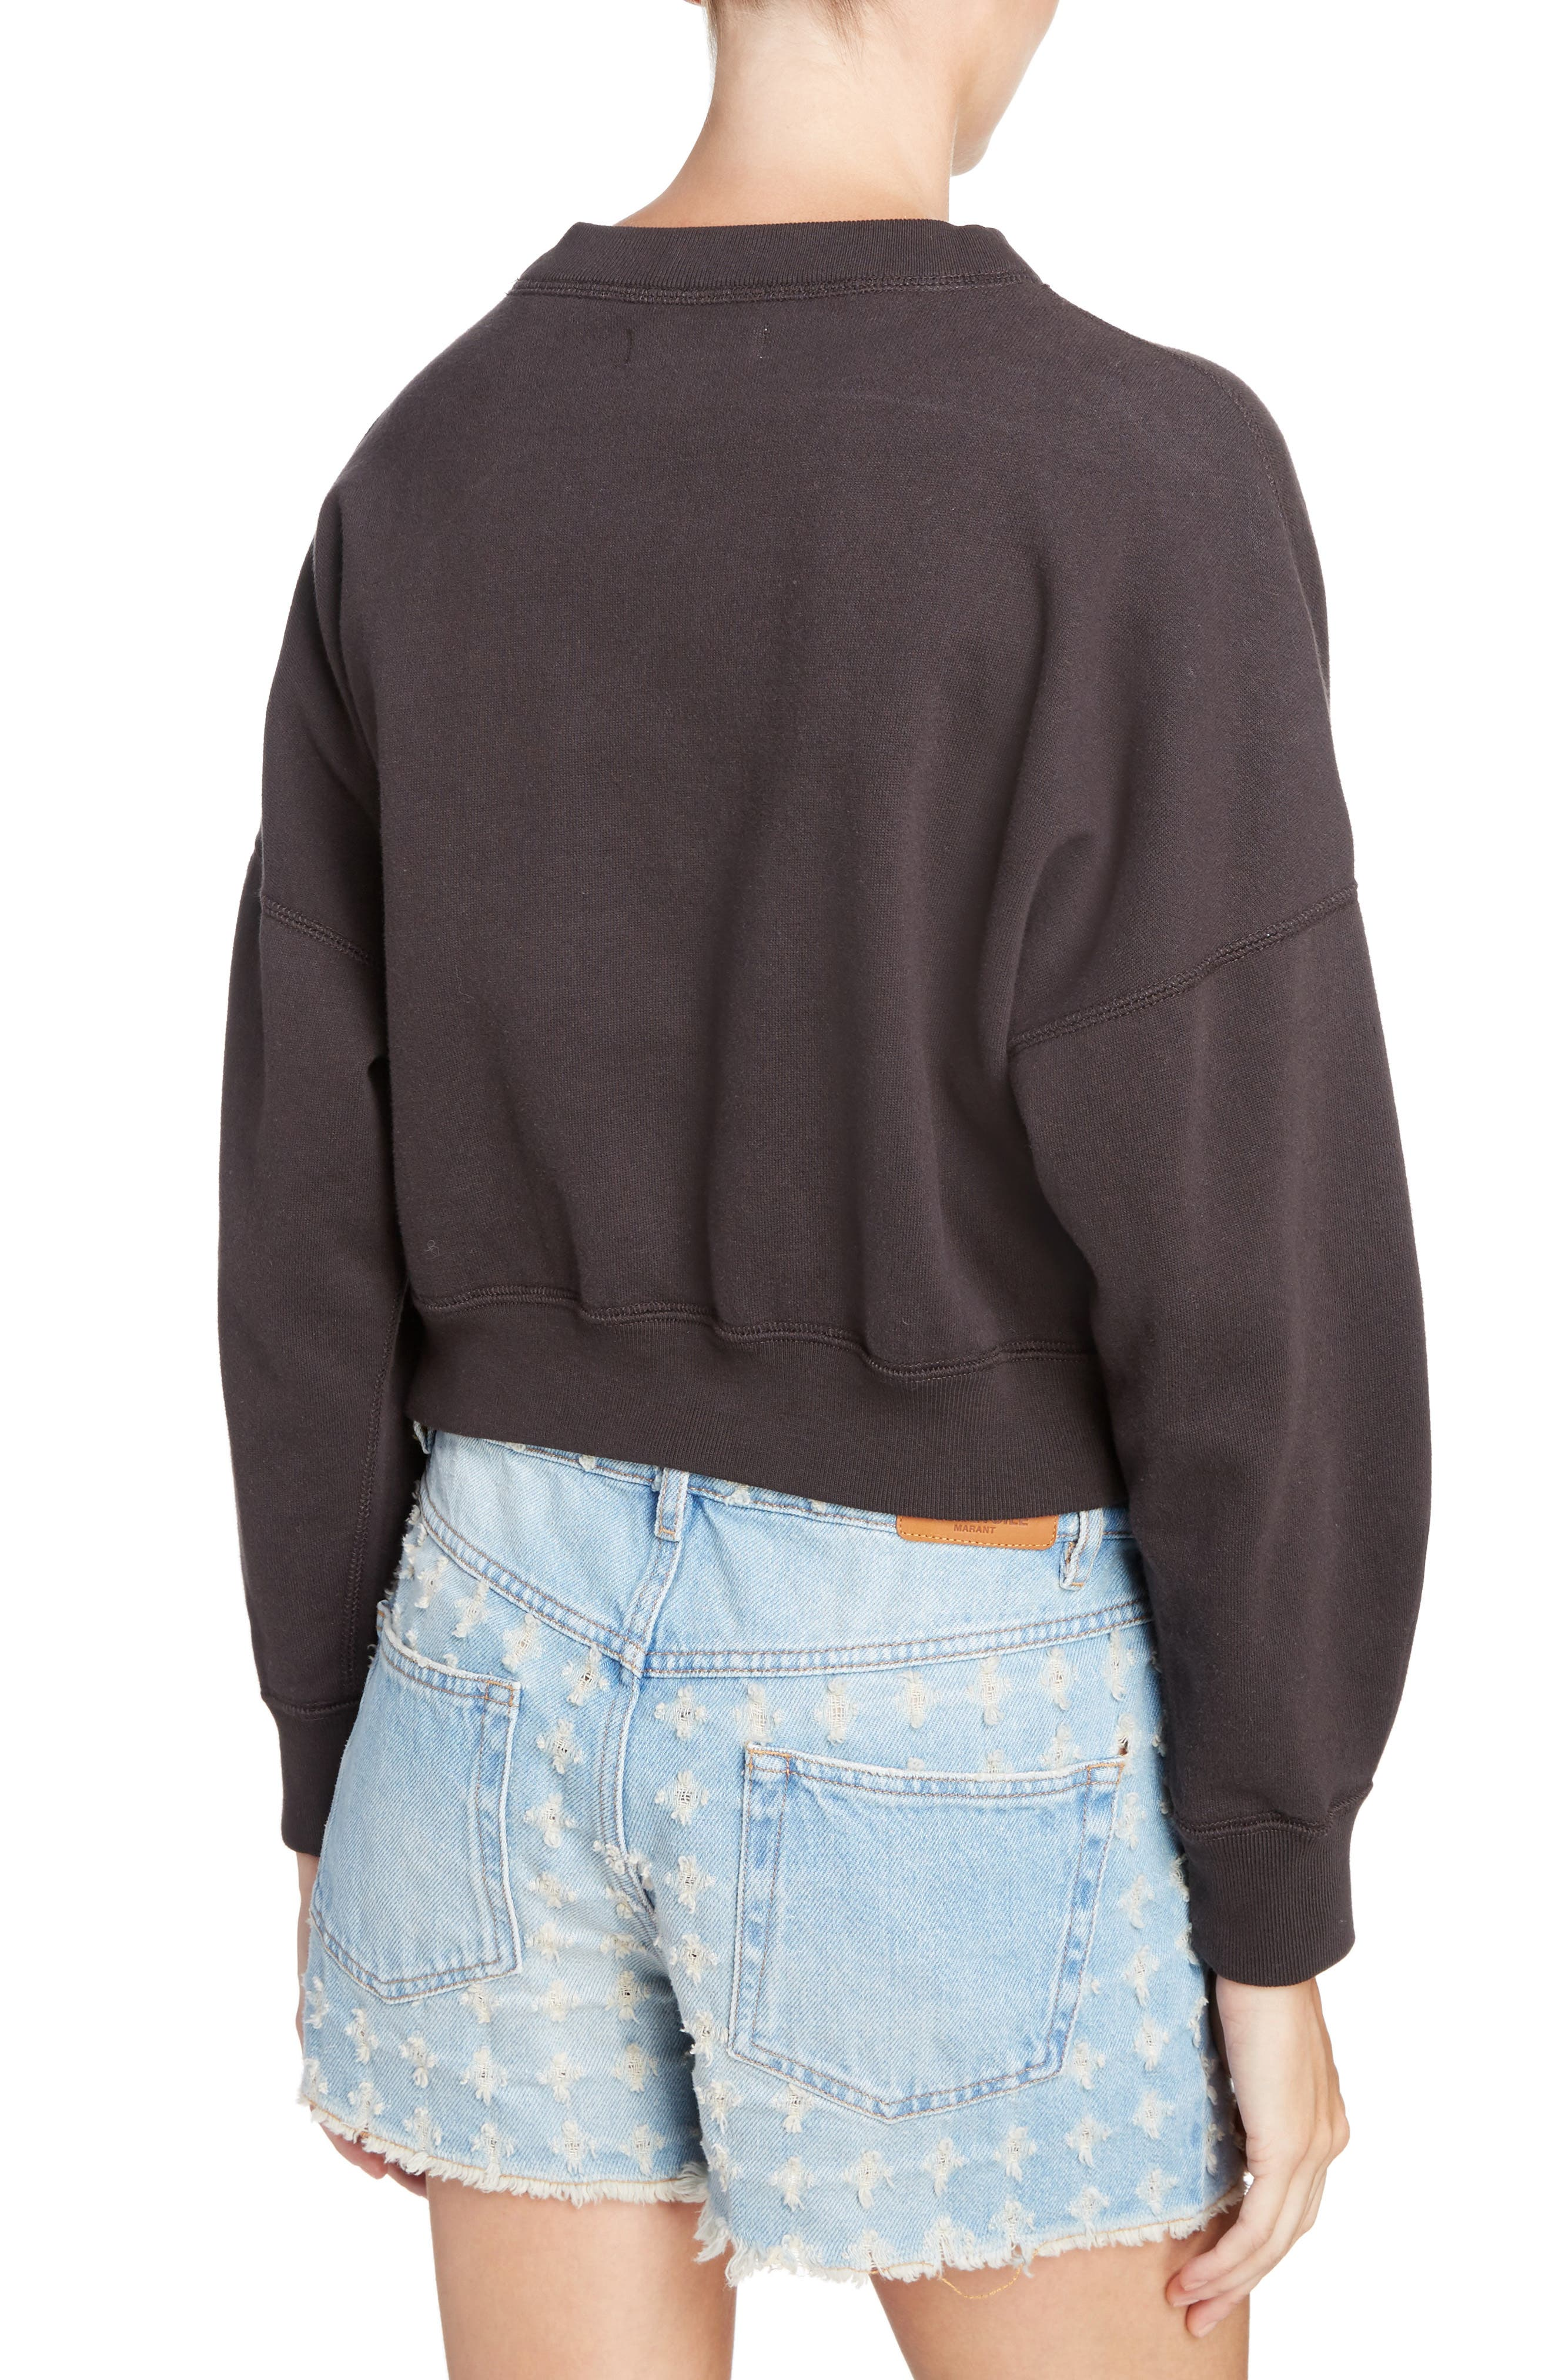 Odilon Sweatshirt,                             Alternate thumbnail 2, color,                             001